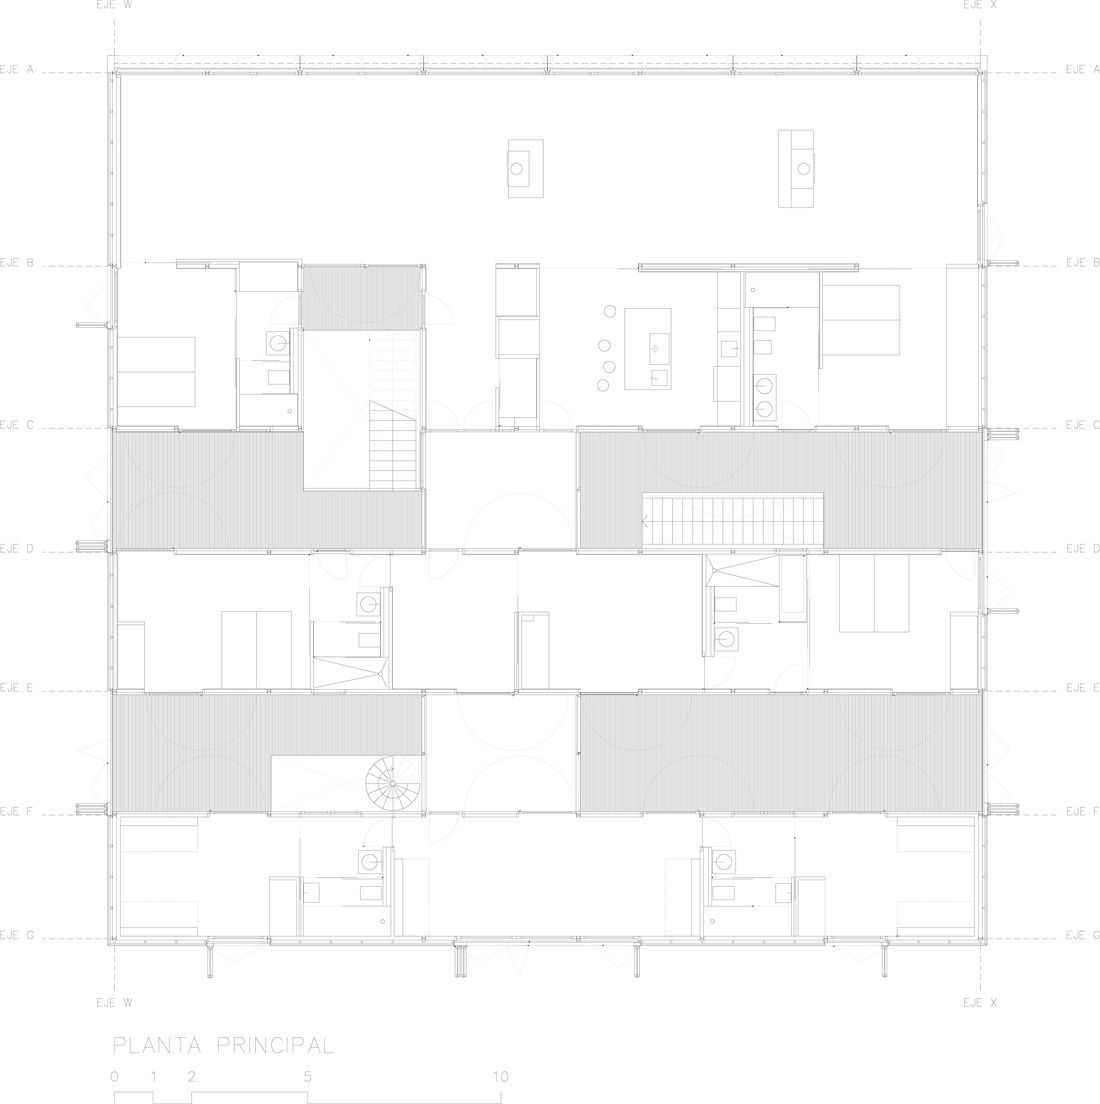 OS House / NOLASTER Servidorarchivo�03_CASA OSPUBLICACIONESQuaderns�4_PLANTA – ArchDaily